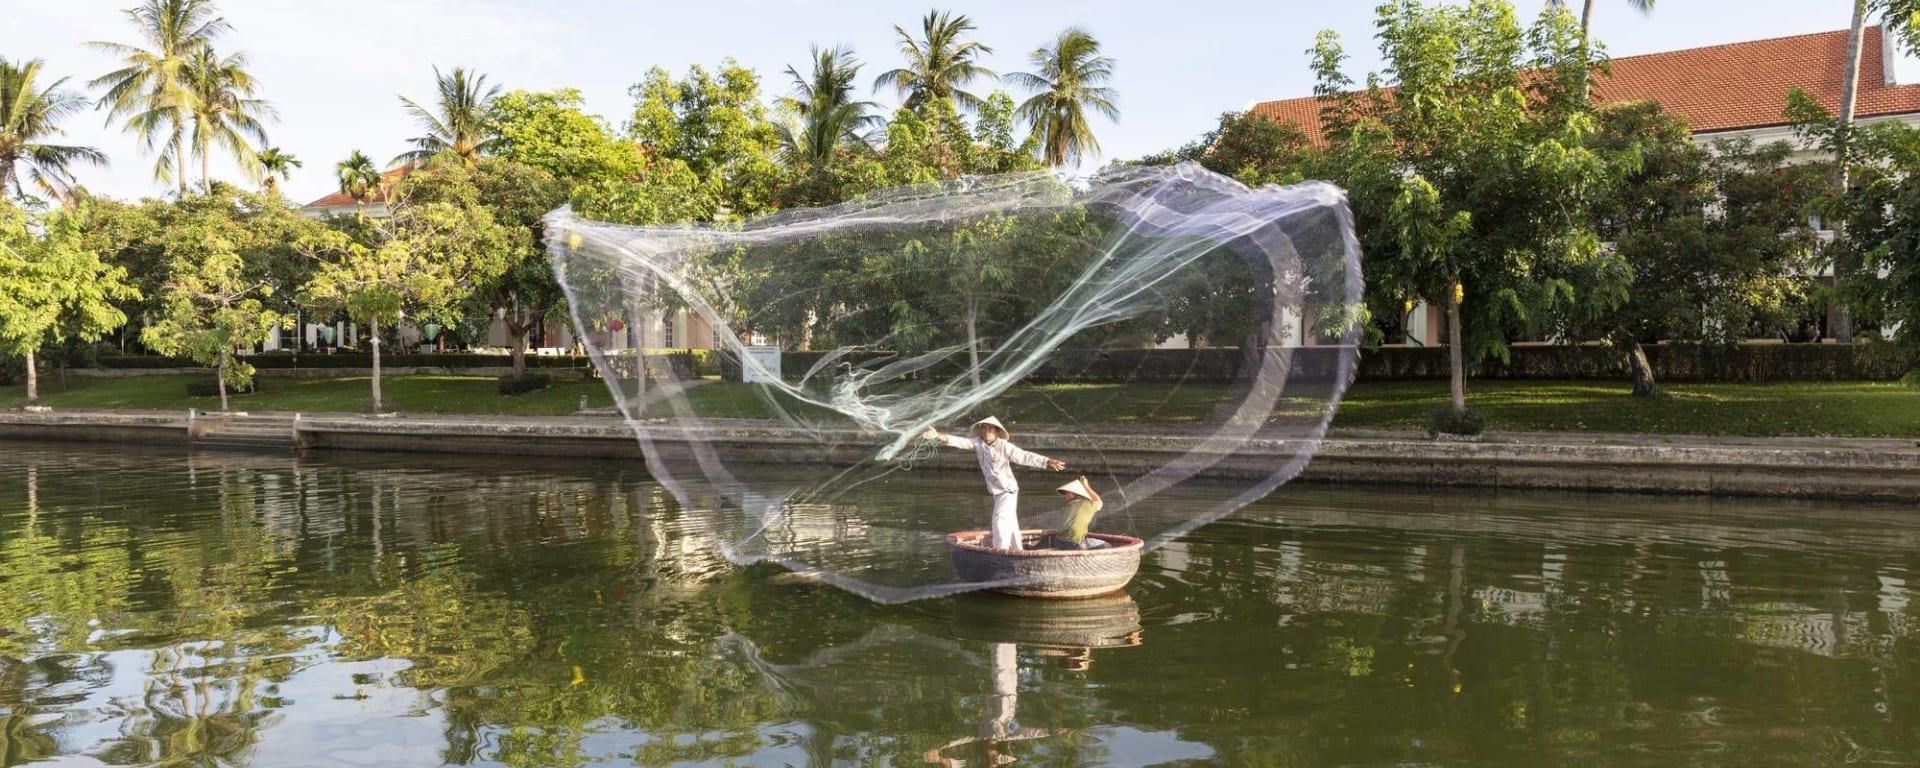 Anantara Hoi An Resort: Fisherman at the Resort Riverfront